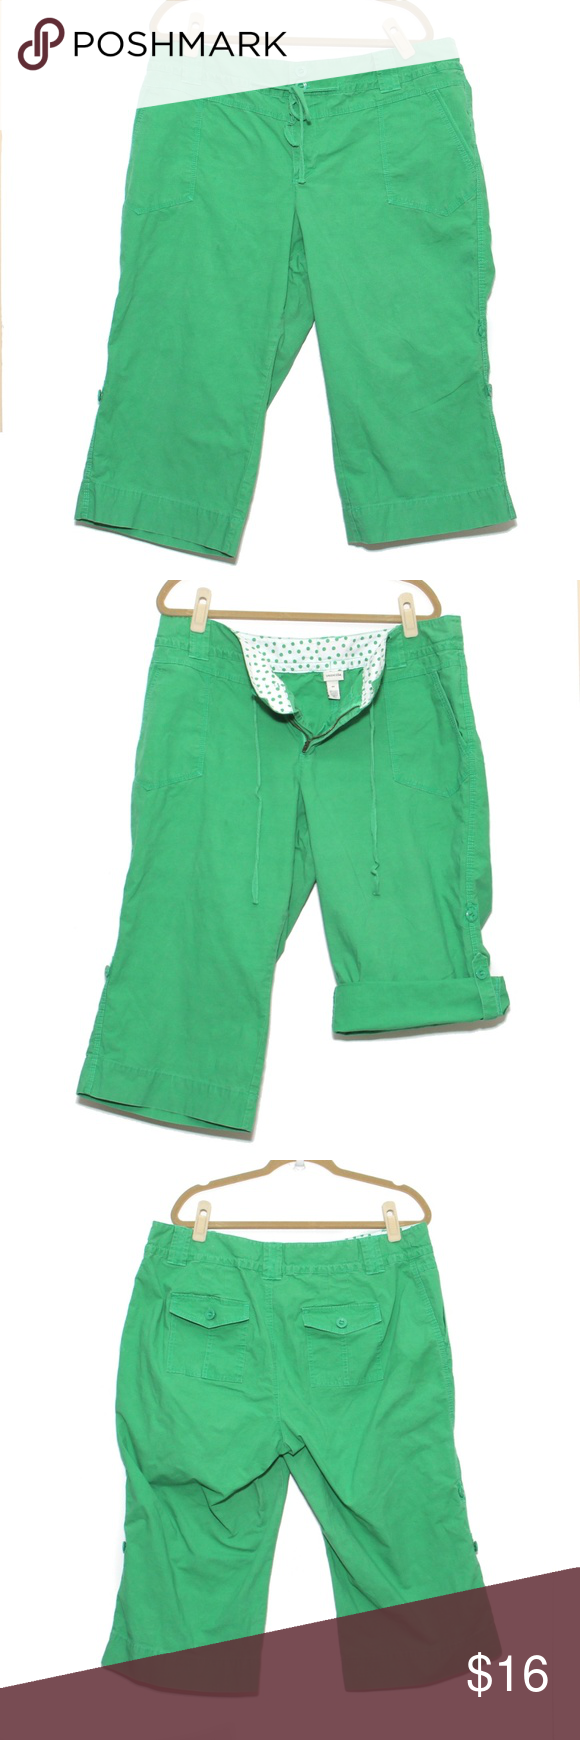 Venezia - Crop pants roll-tab - size 20 Green roll tab style